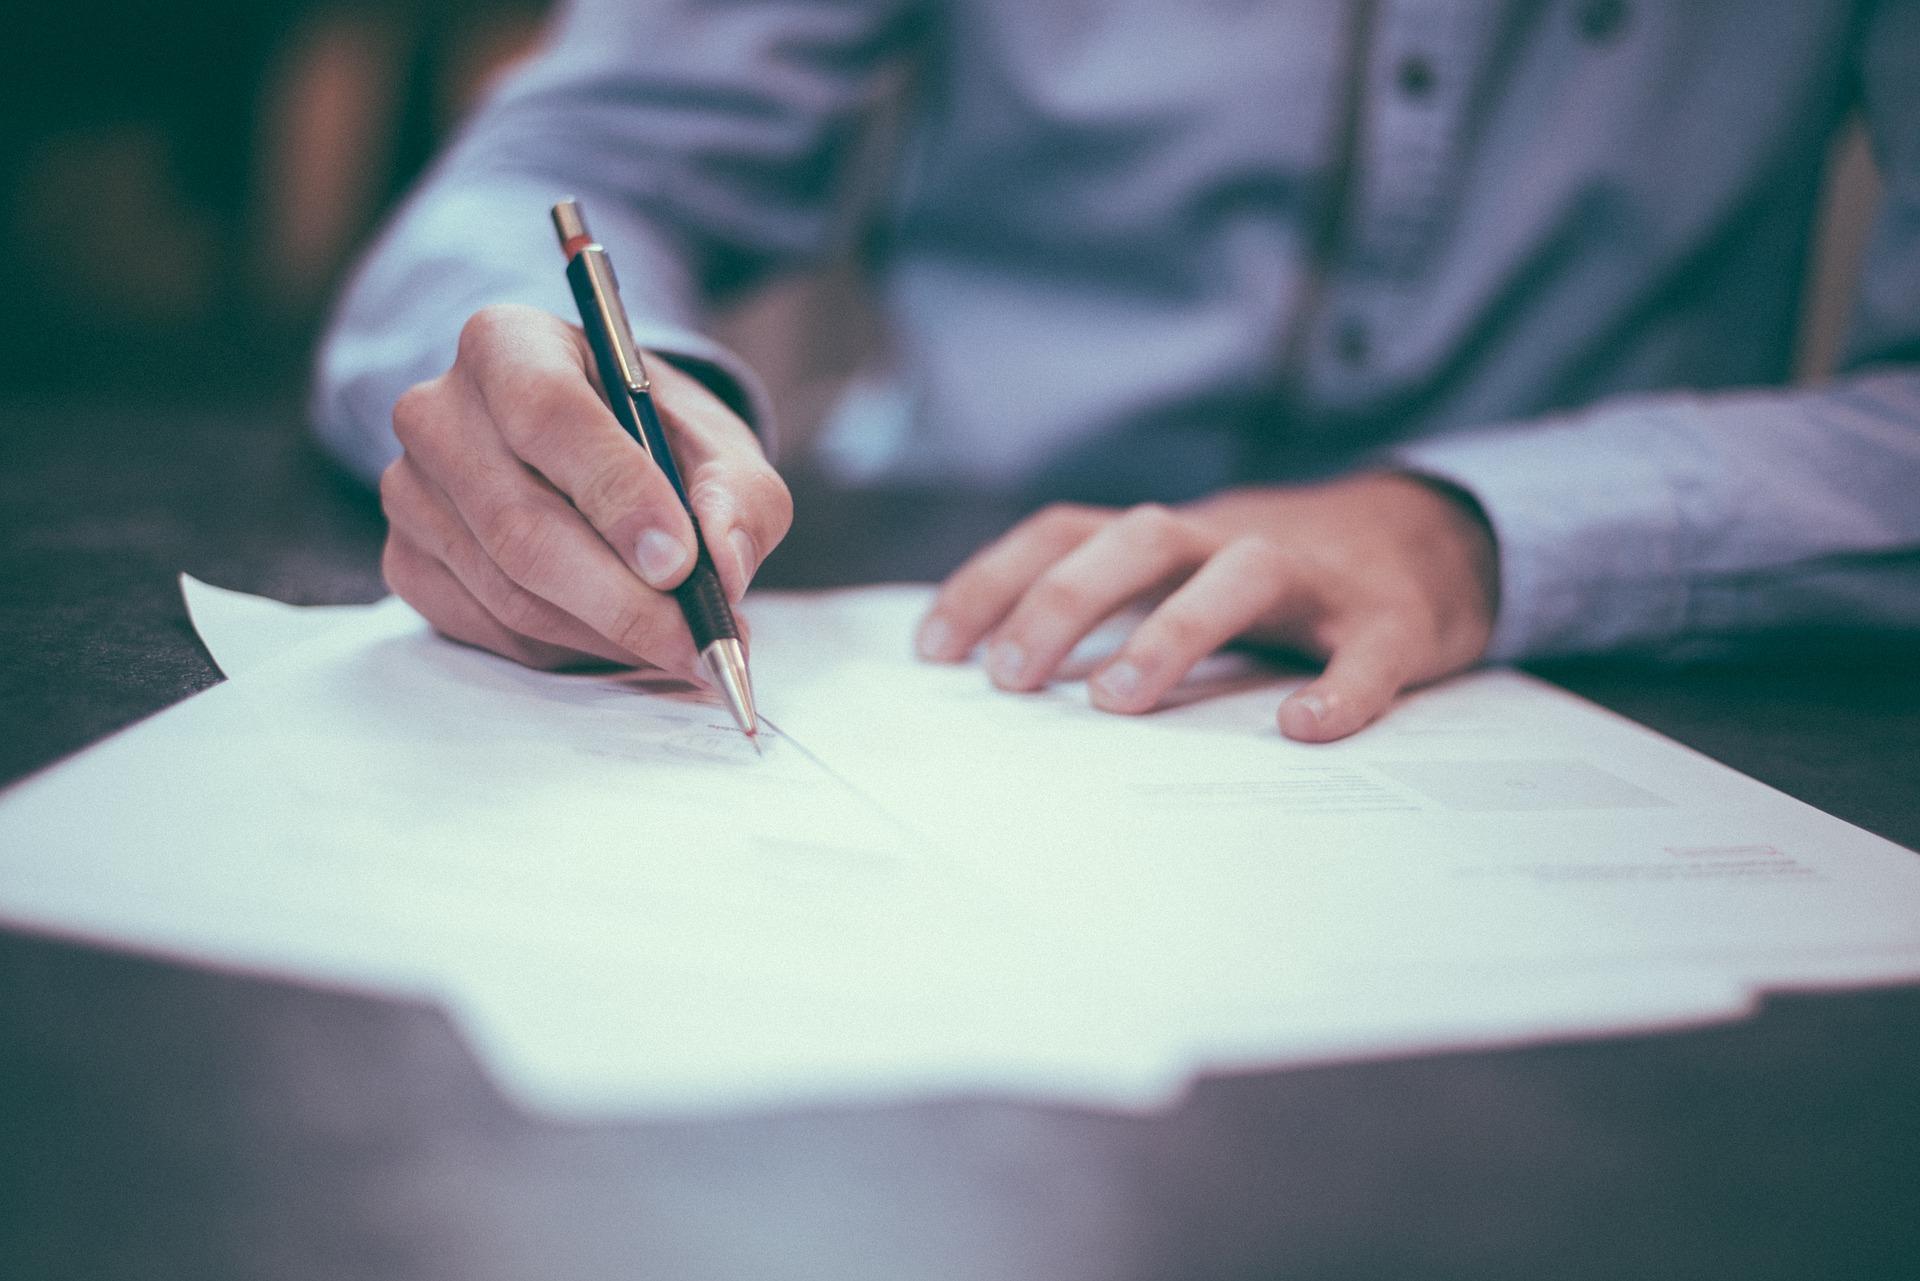 5 Tips for Writing an Effective FDA 483 Response